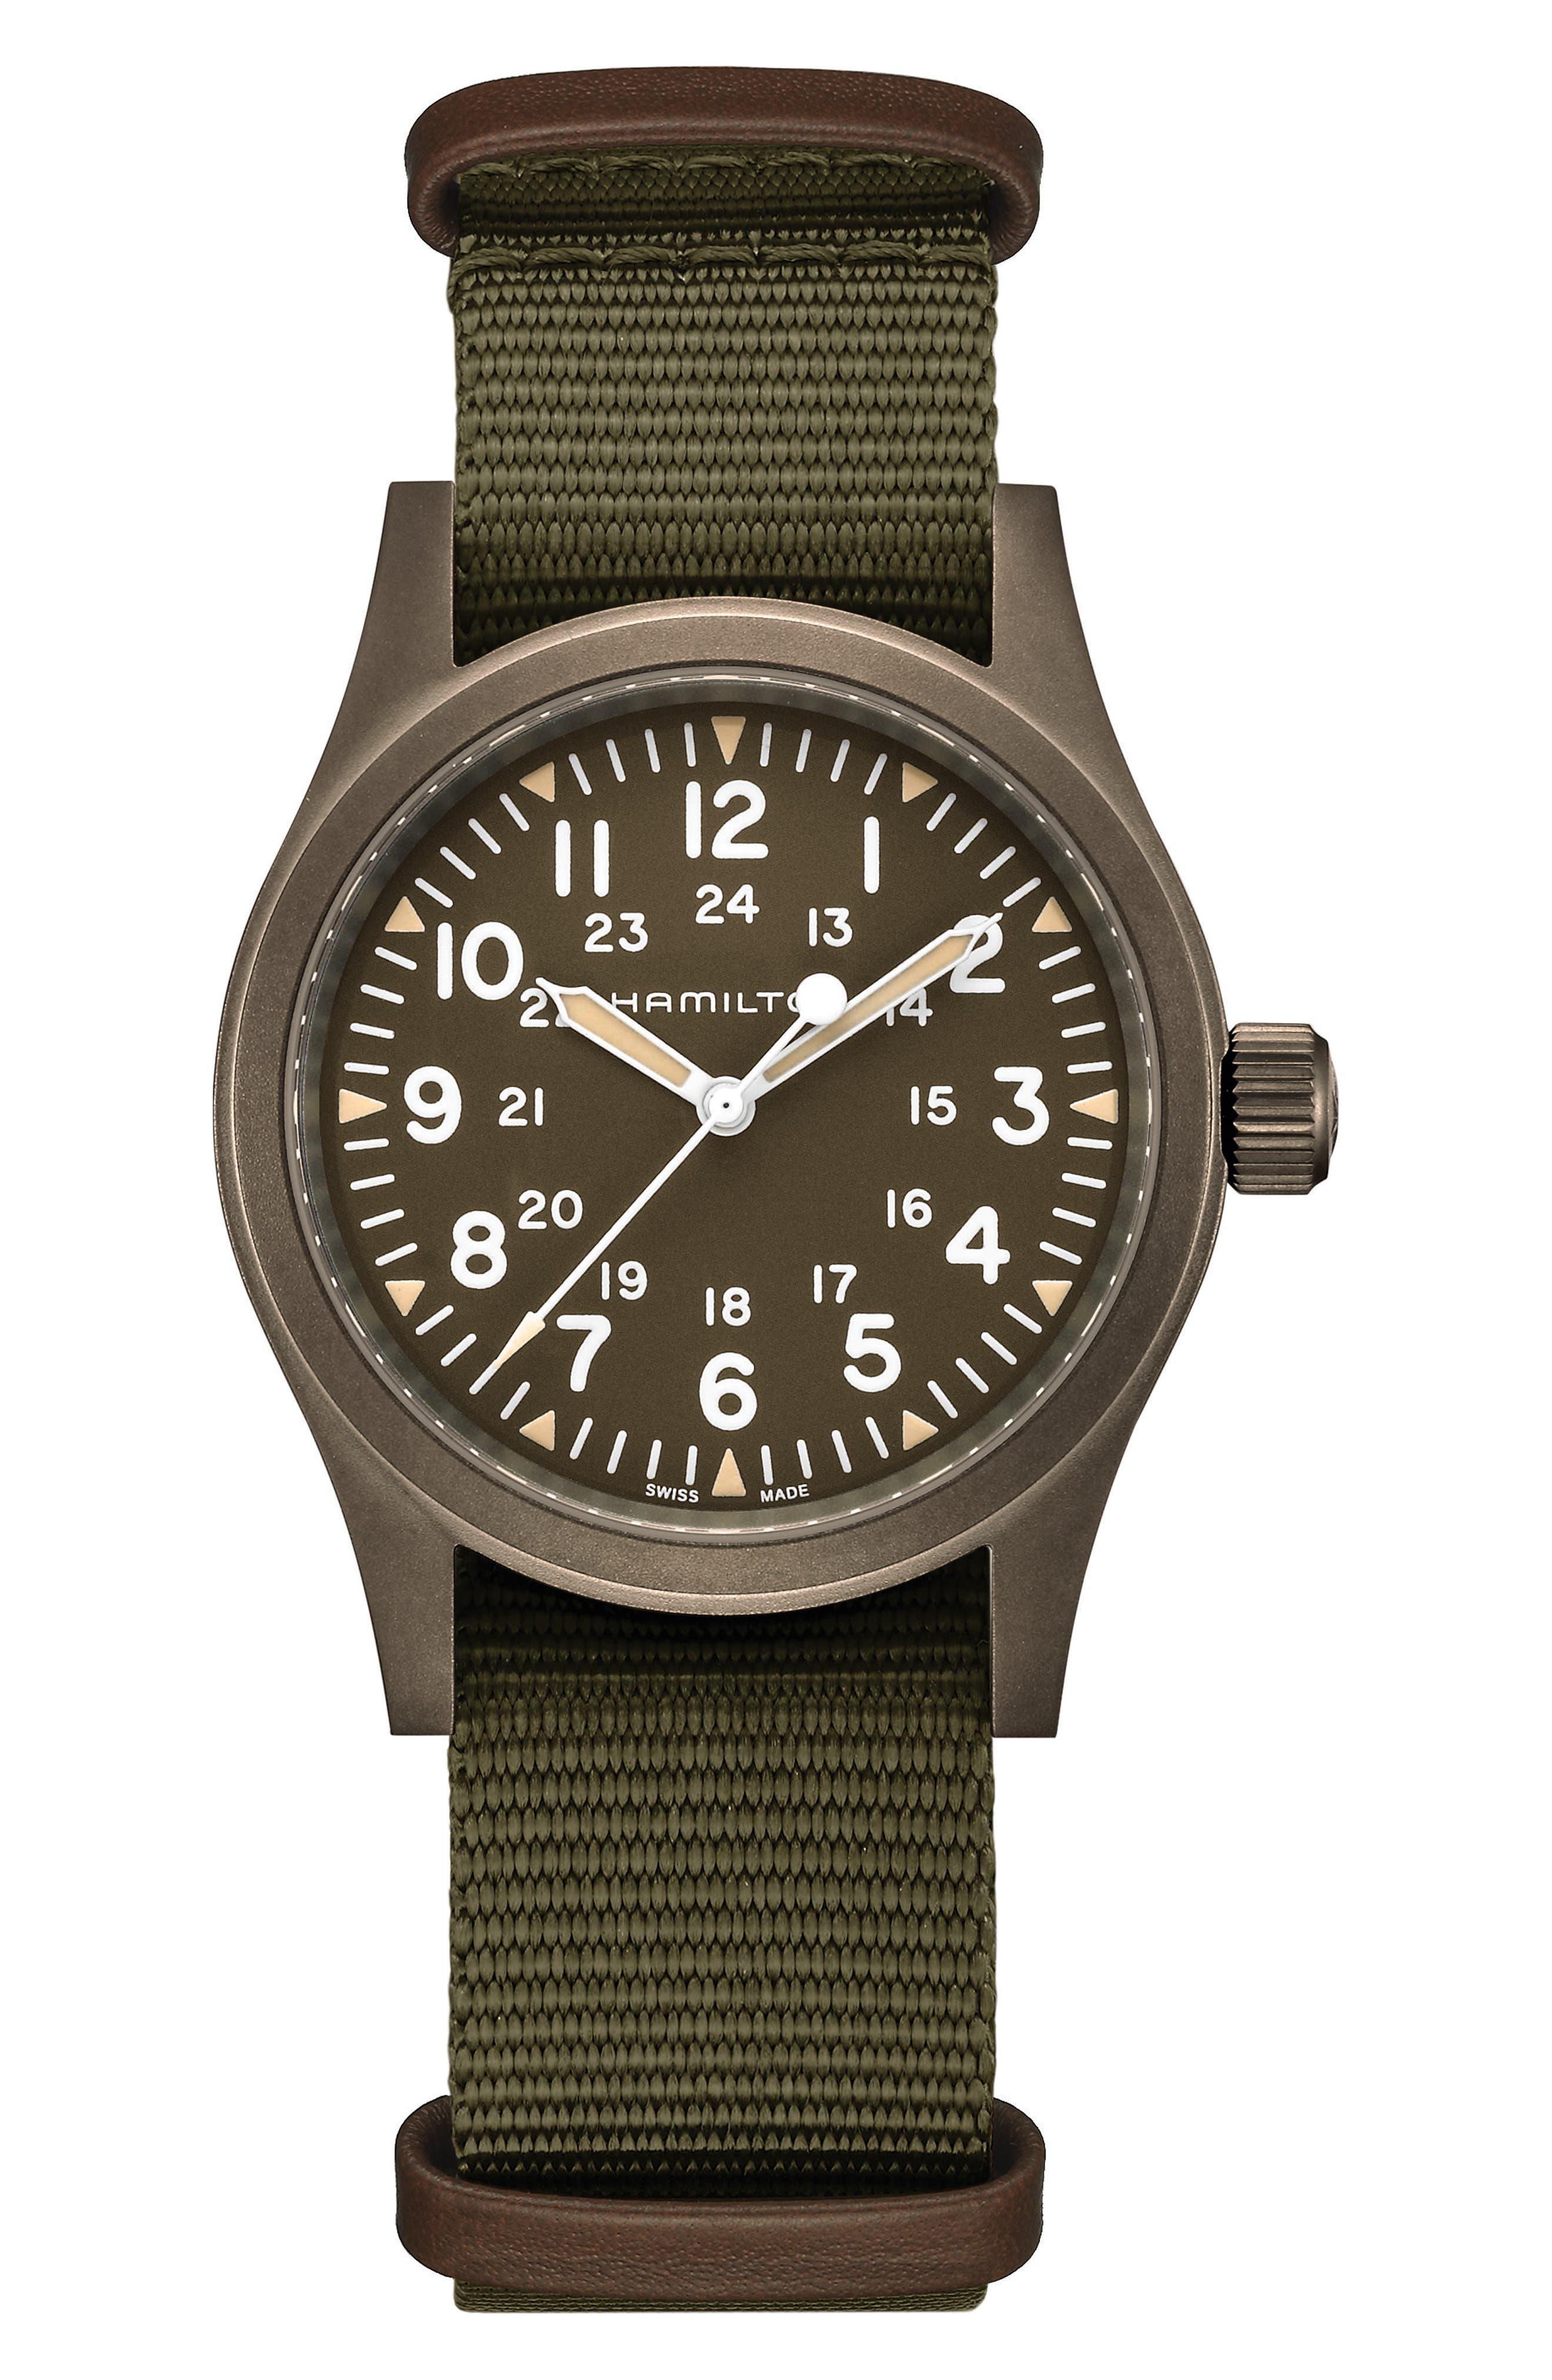 Khaki Field Mechanical Nato Strap Watch